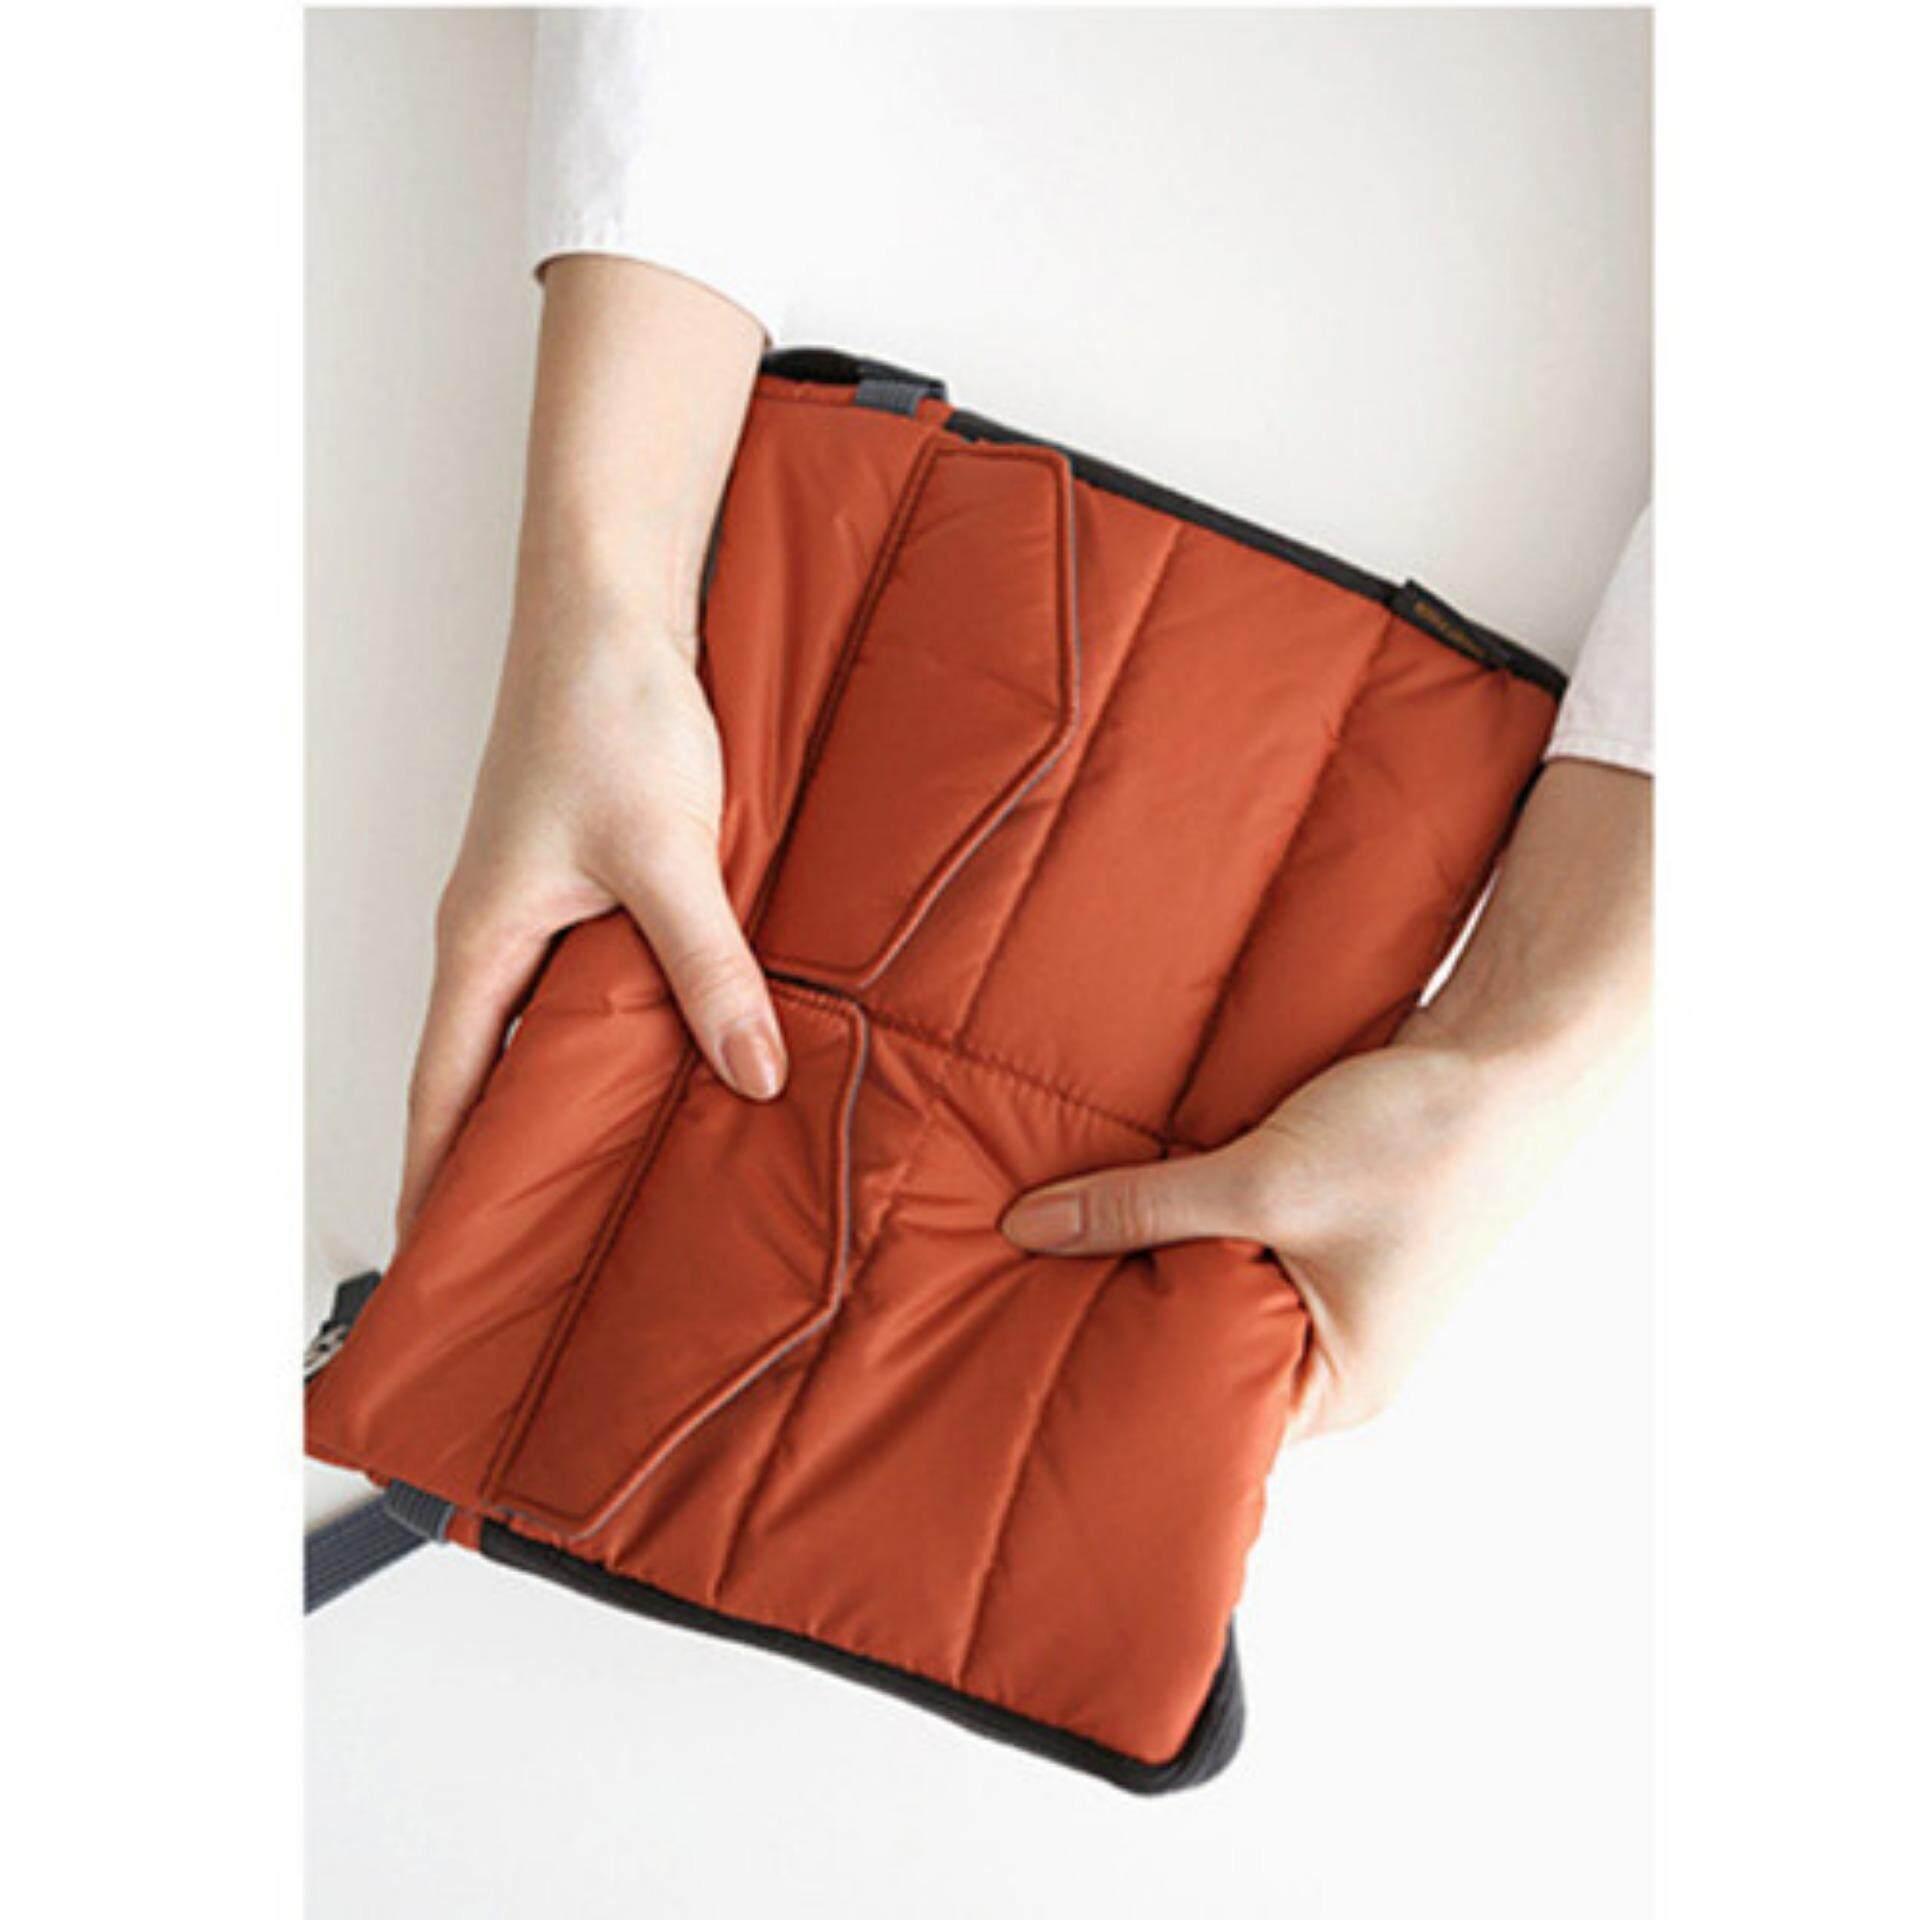 Korea Style Multifunction Gadget Pouch/Bag Organizer (1) Orange Brown